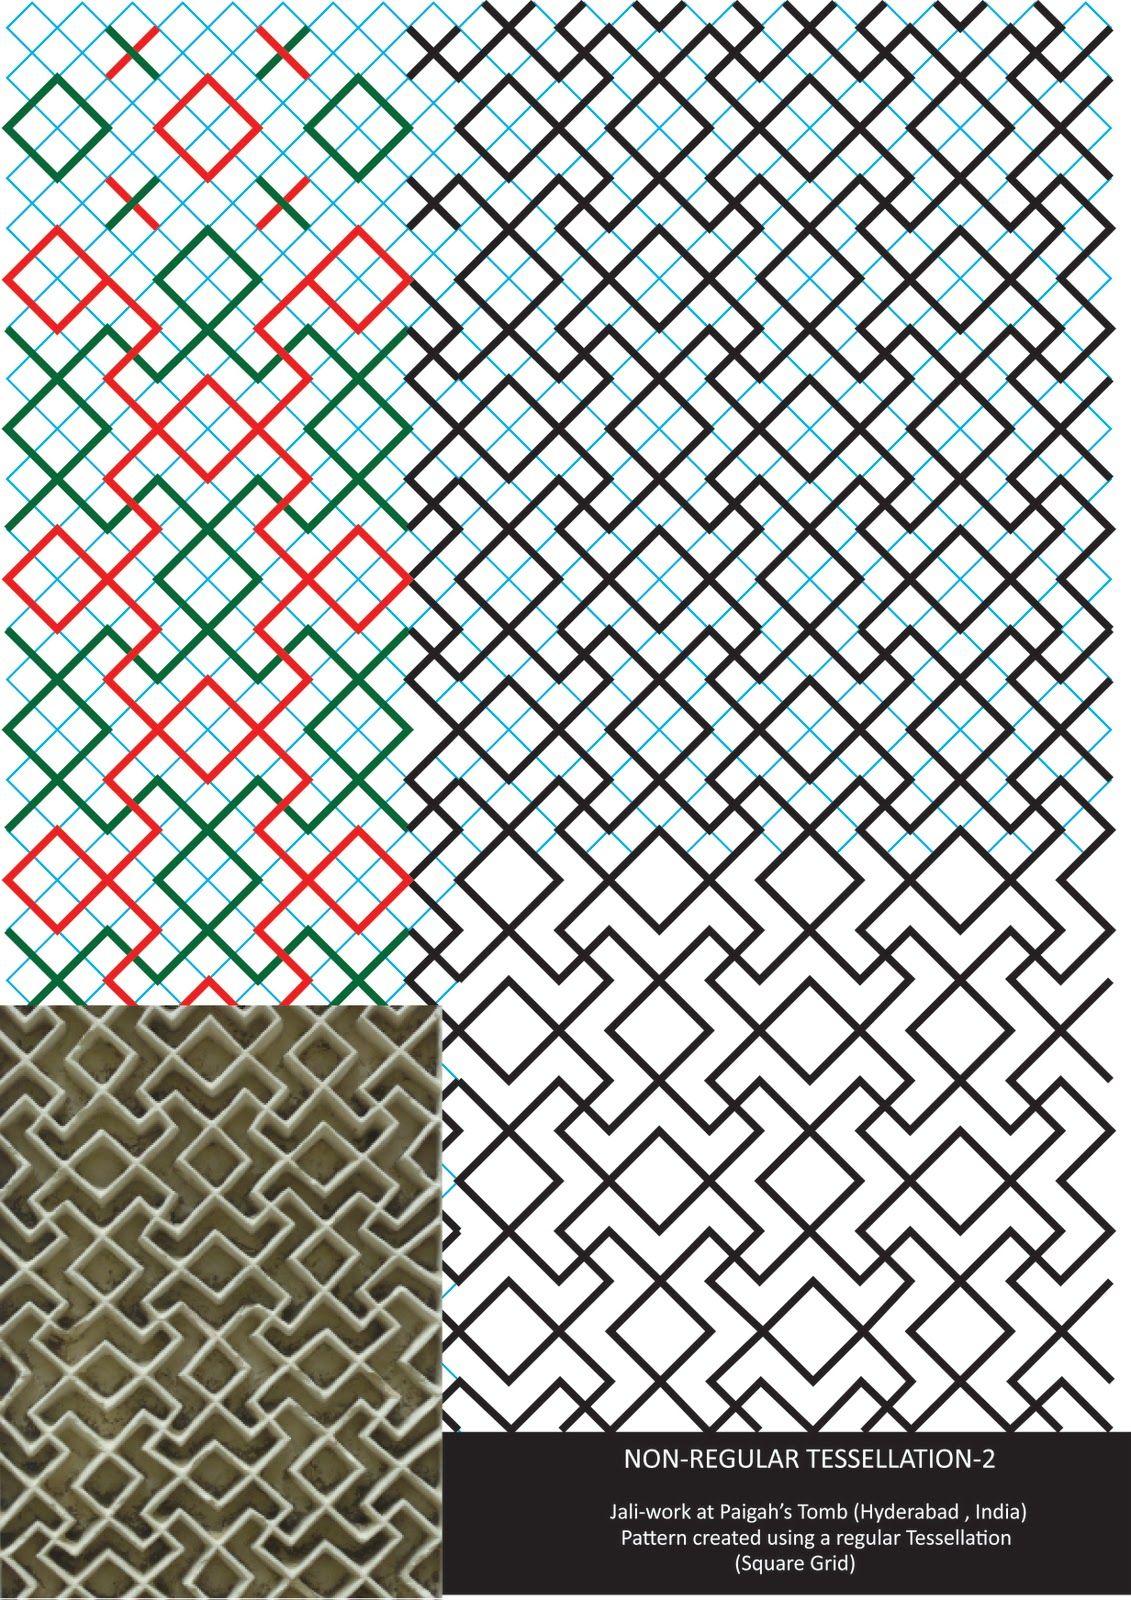 Xplore Amp Xpress Fun With Mathematics How To Draw Beautiful Islamic Geometric Patterns